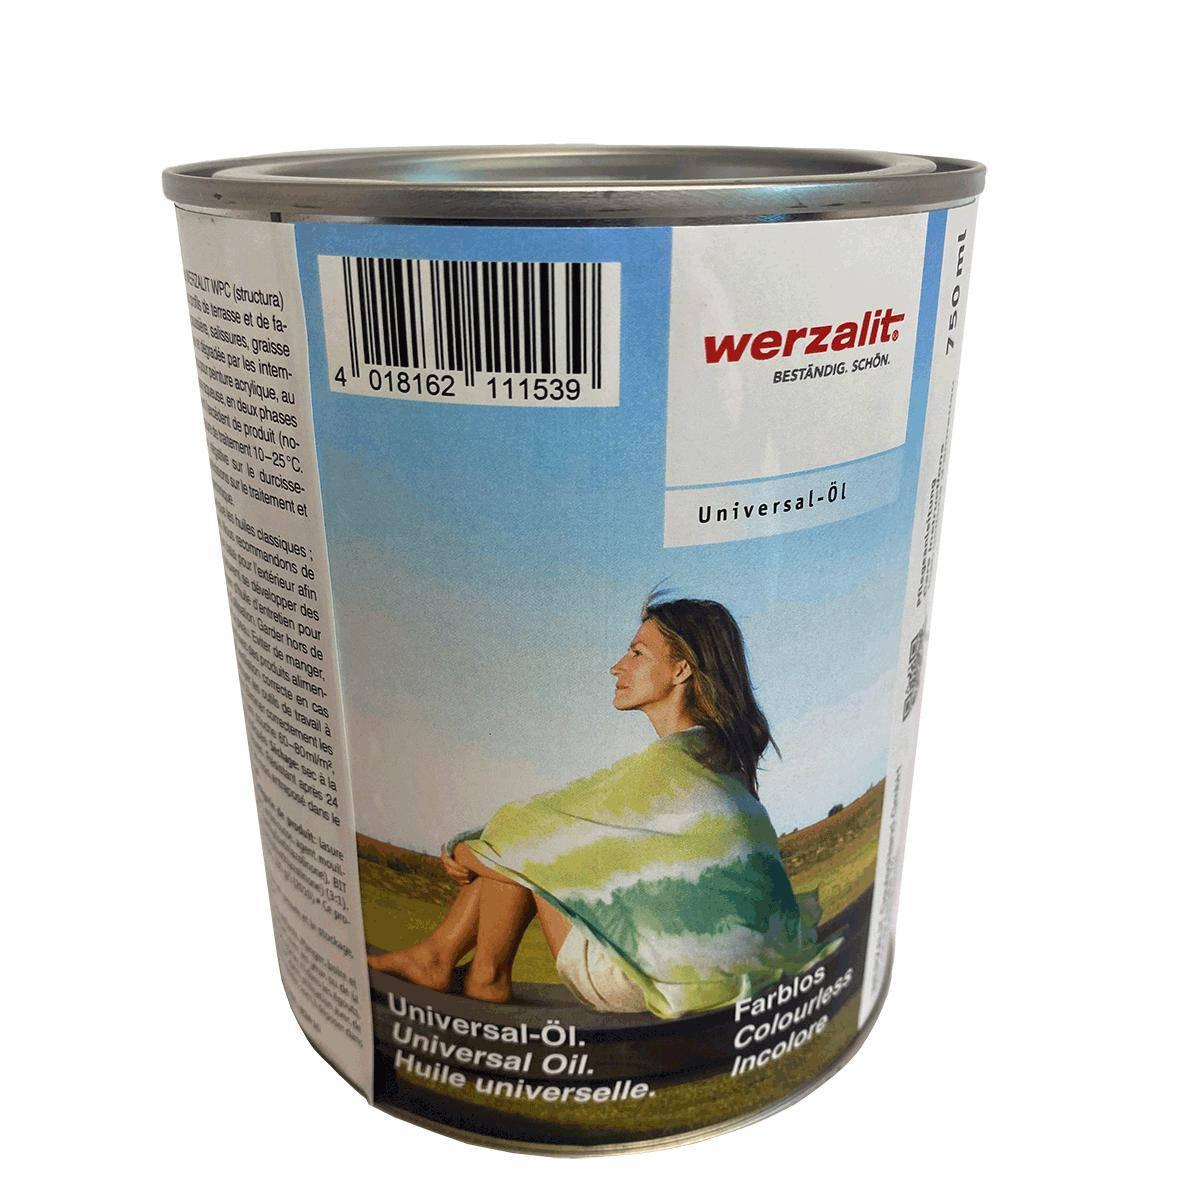 Universaloel 22 425 003 - https://www.werzalit.com/fr/produit/rustic-top-premium-massivdiele/